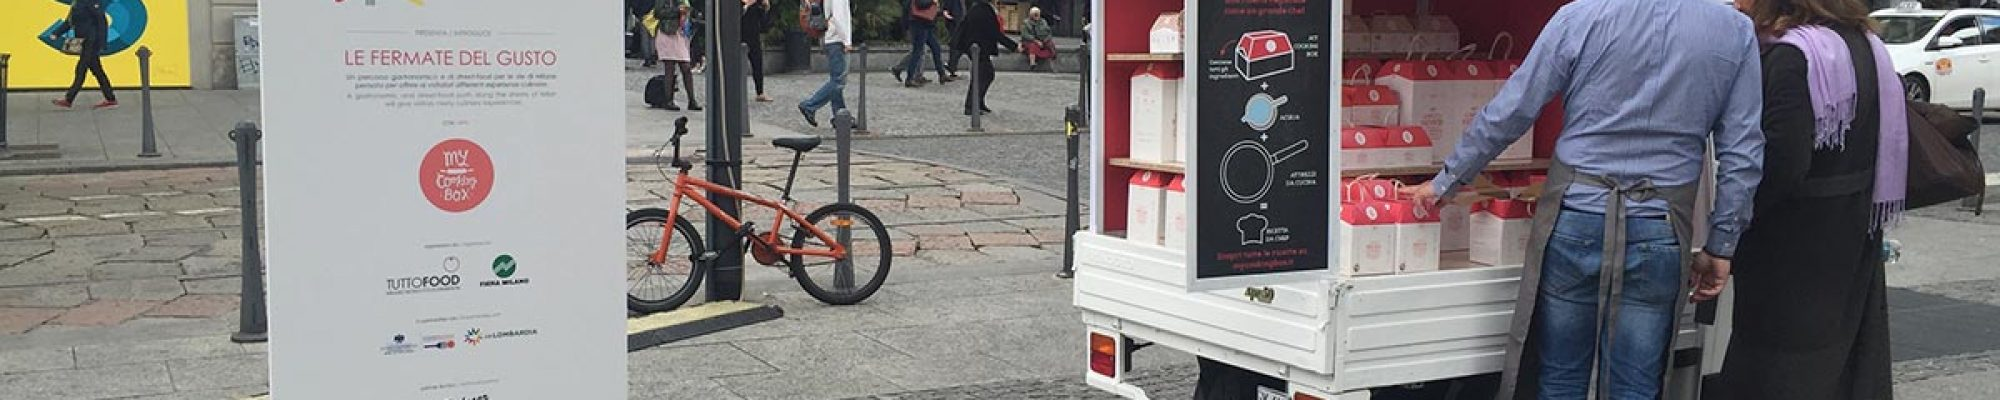 tutto-food-milano-street-food-evento-container-pop-up-mycookingbox-milano-piazza-xxv-aprile-fiera-regione-lombardia-eventi.jpg